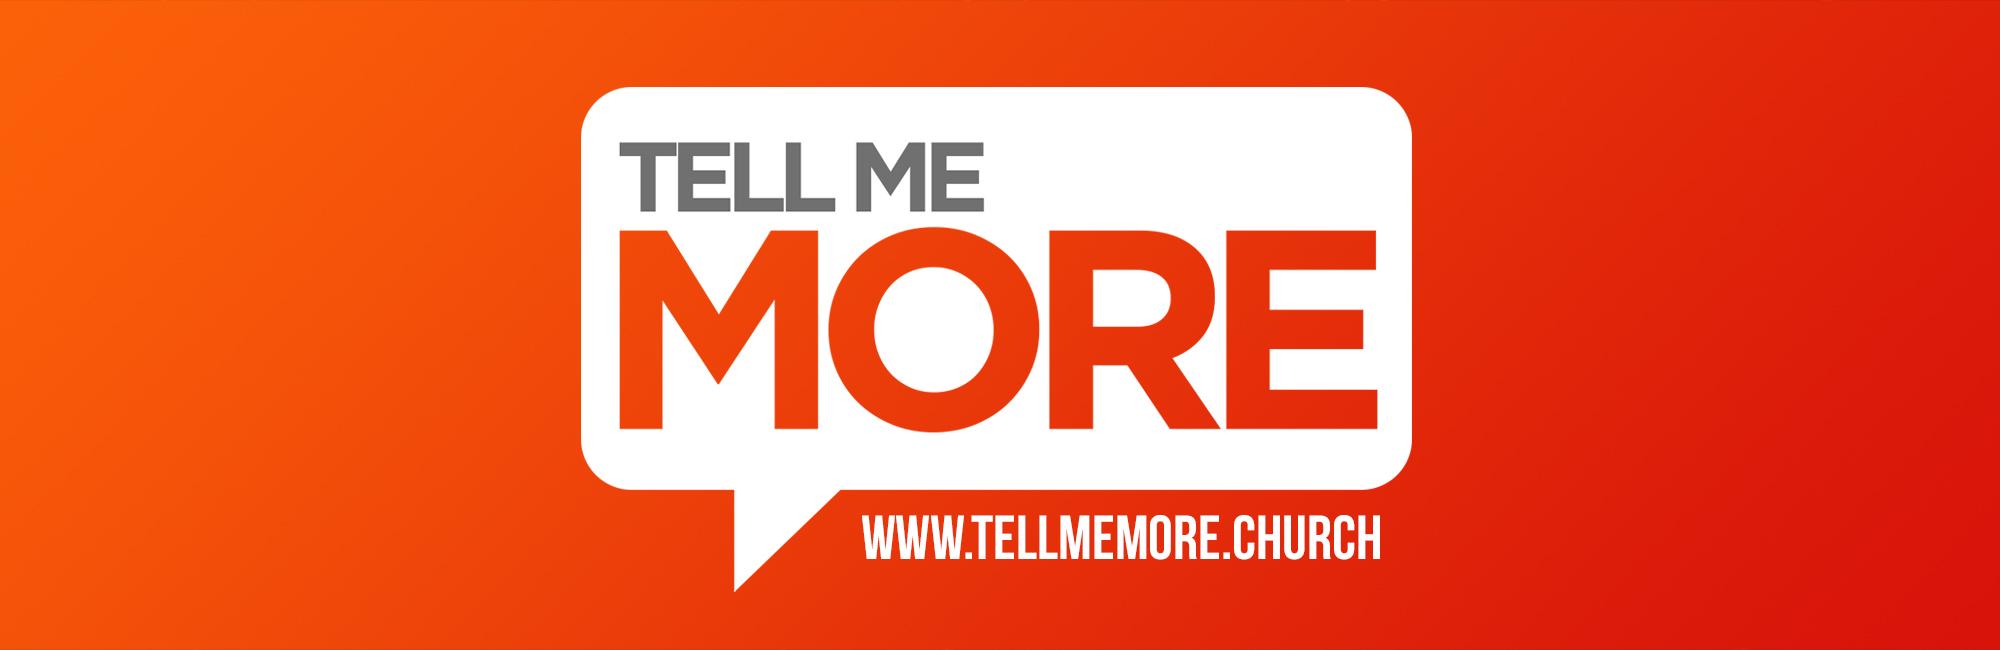 Tell Me More - Sermon Web Header